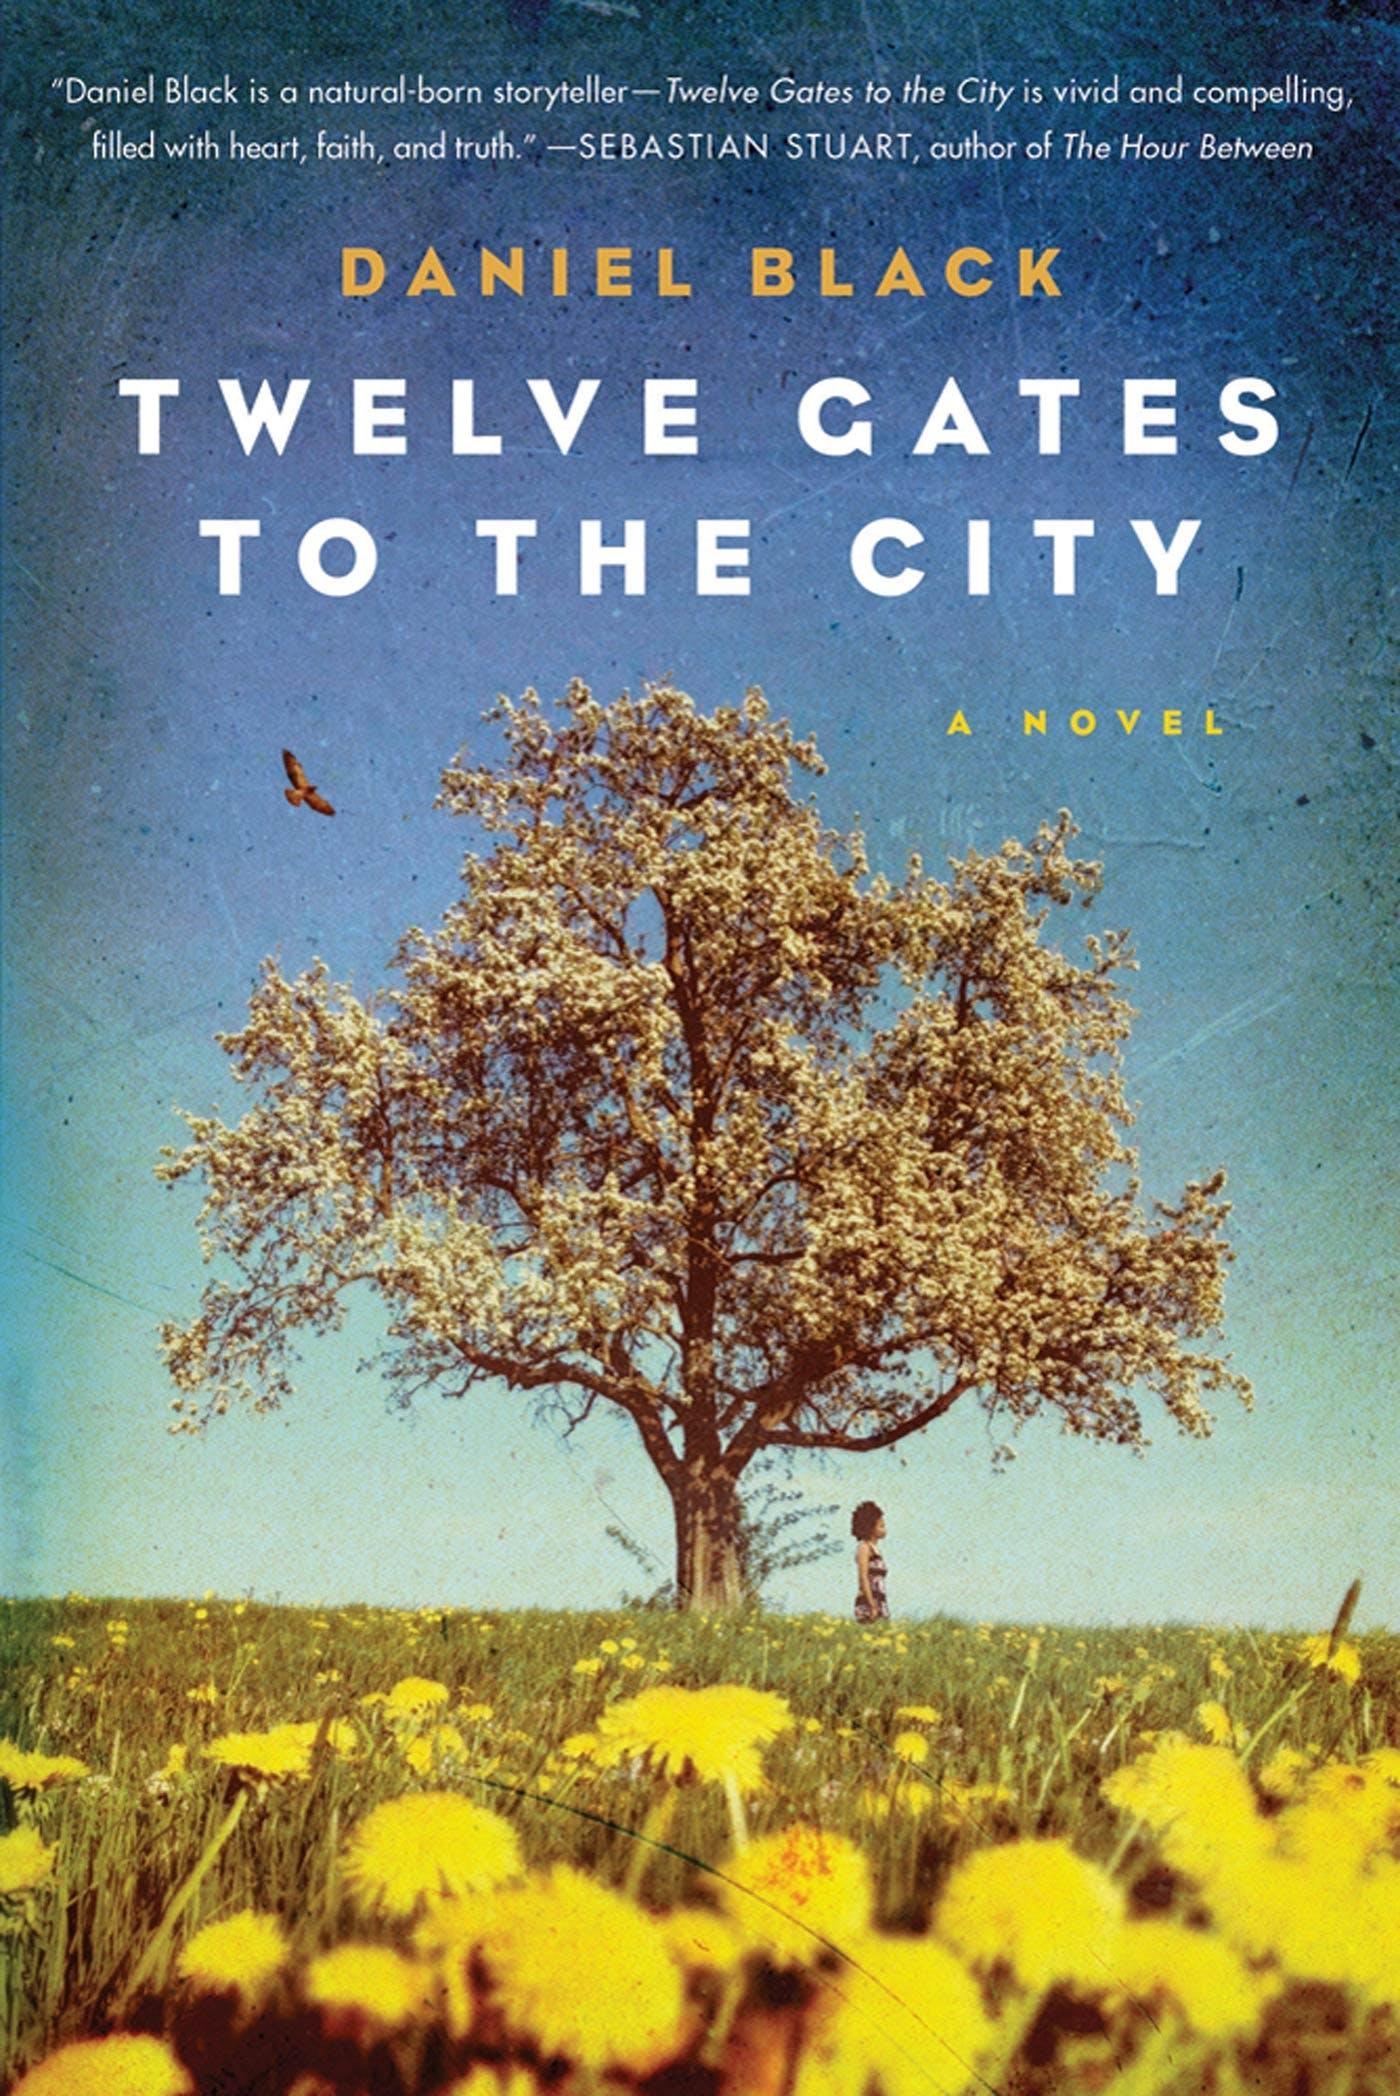 Image of Twelve Gates to the City